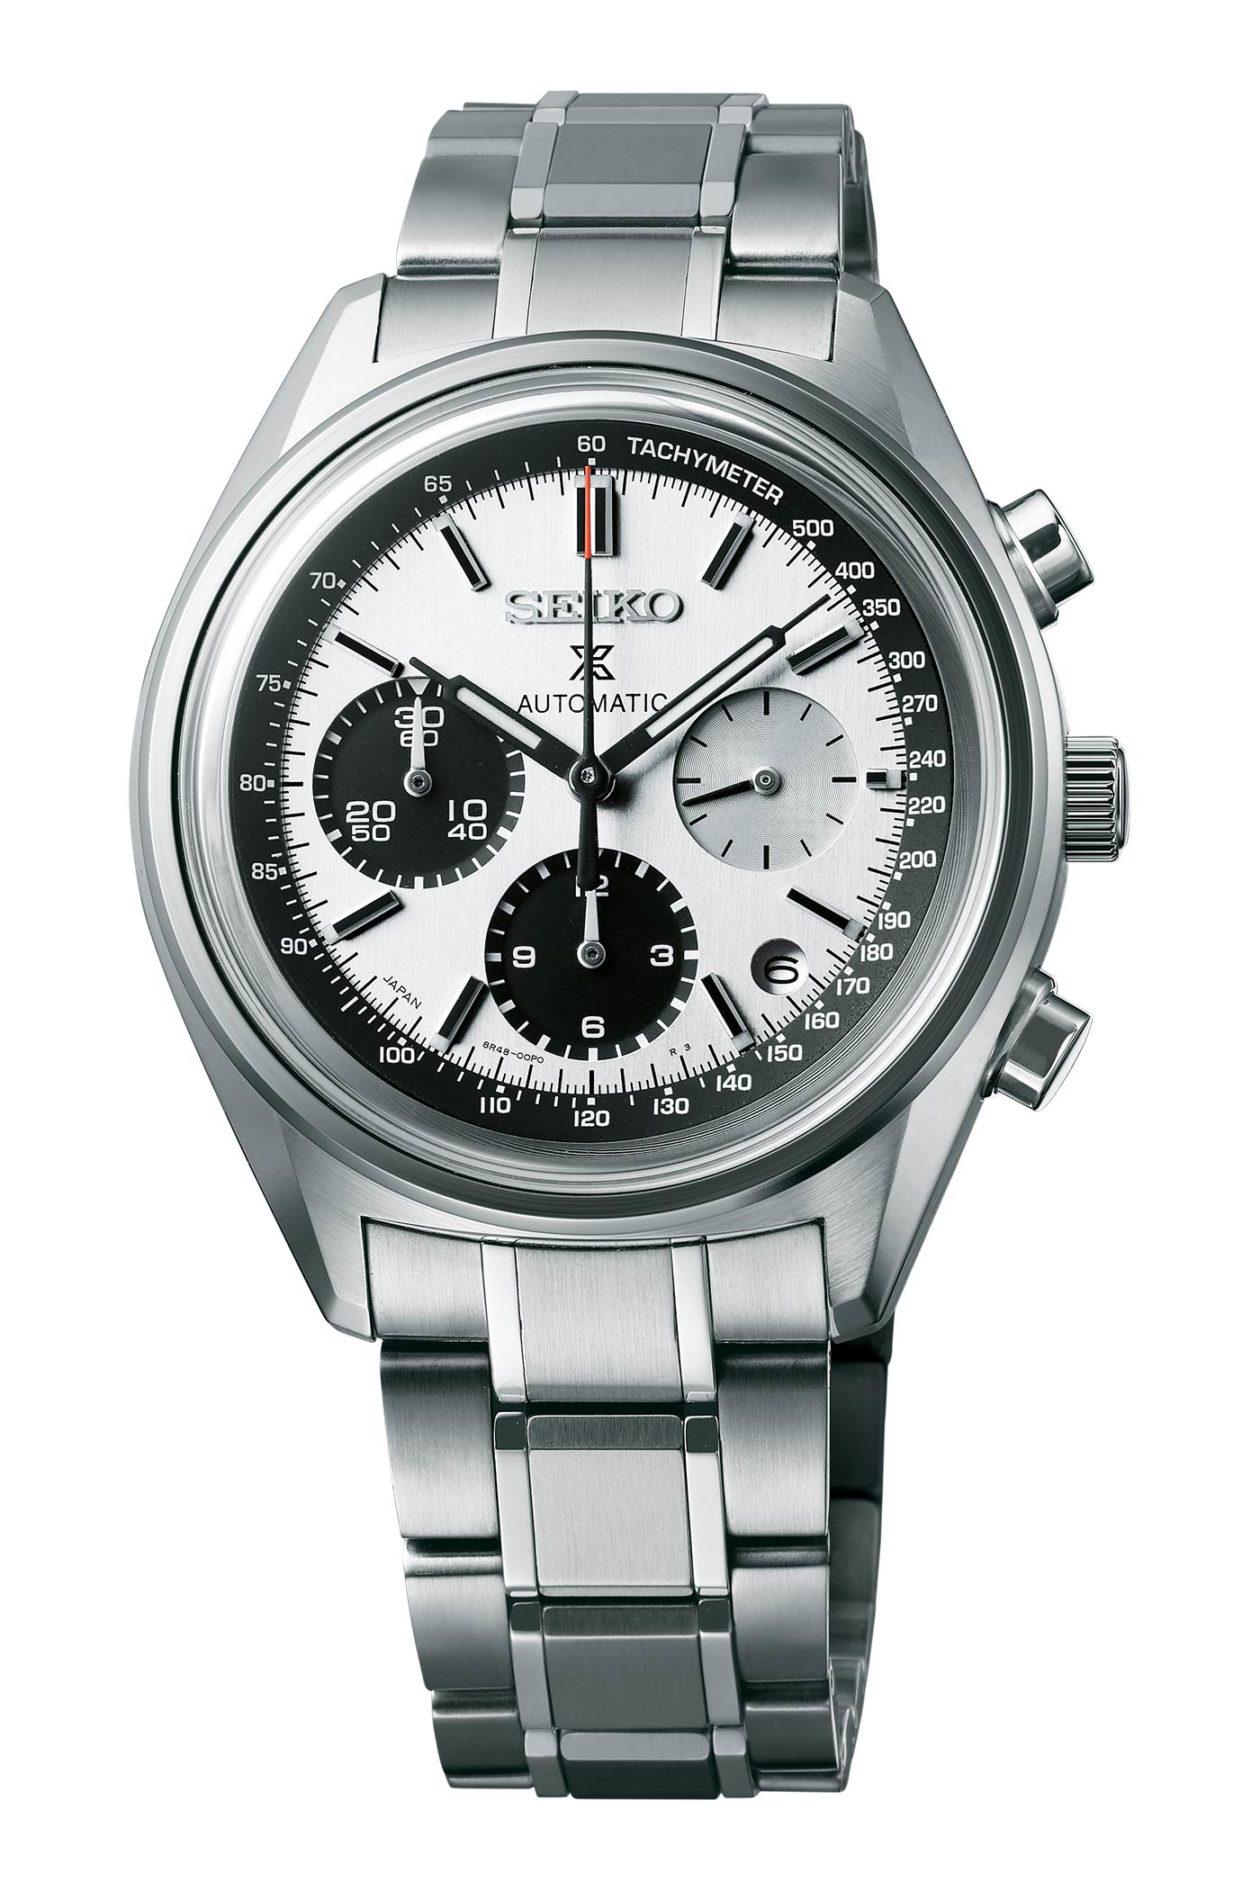 Seiko Automatic Chronograph Prospex SRQ029